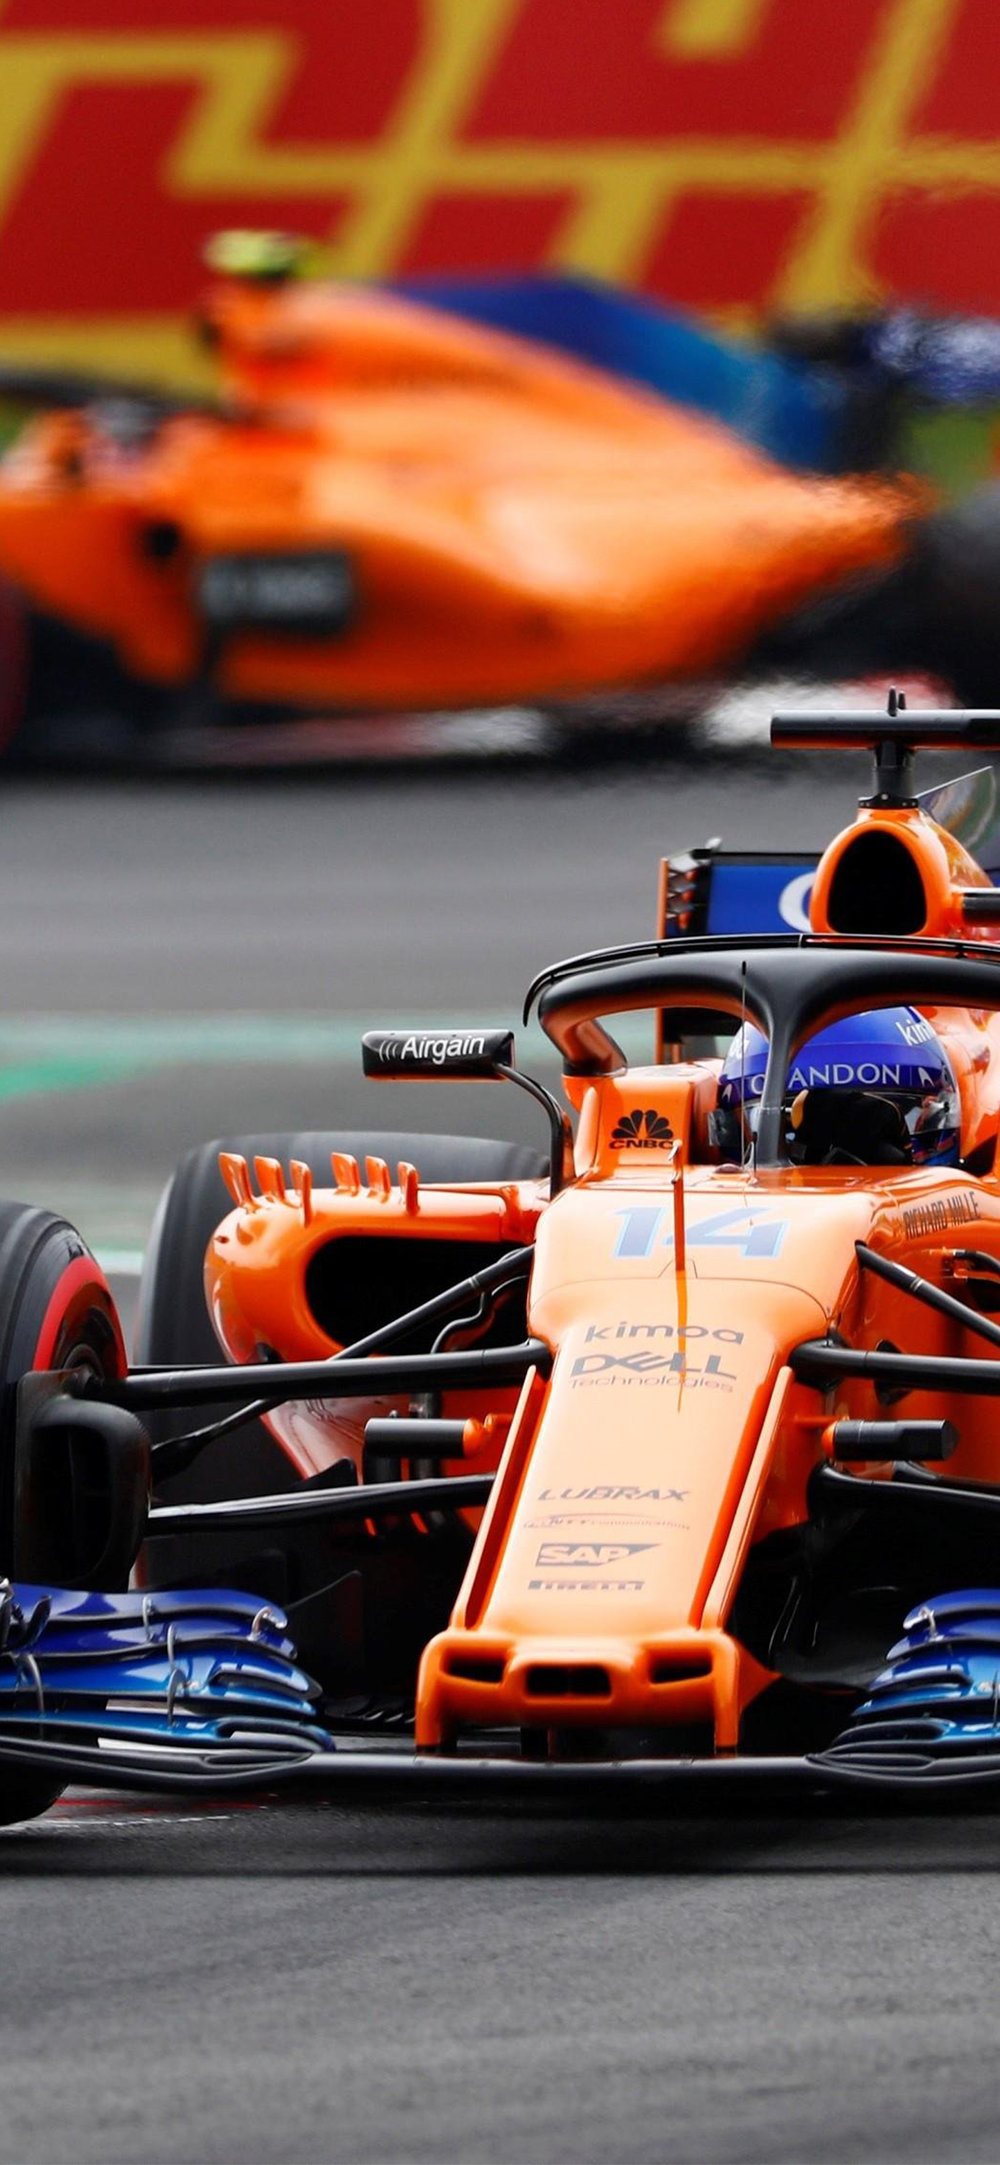 fernando_alonso_mclaren_spanish_f1_grand_prix_2018_race_day.jpg